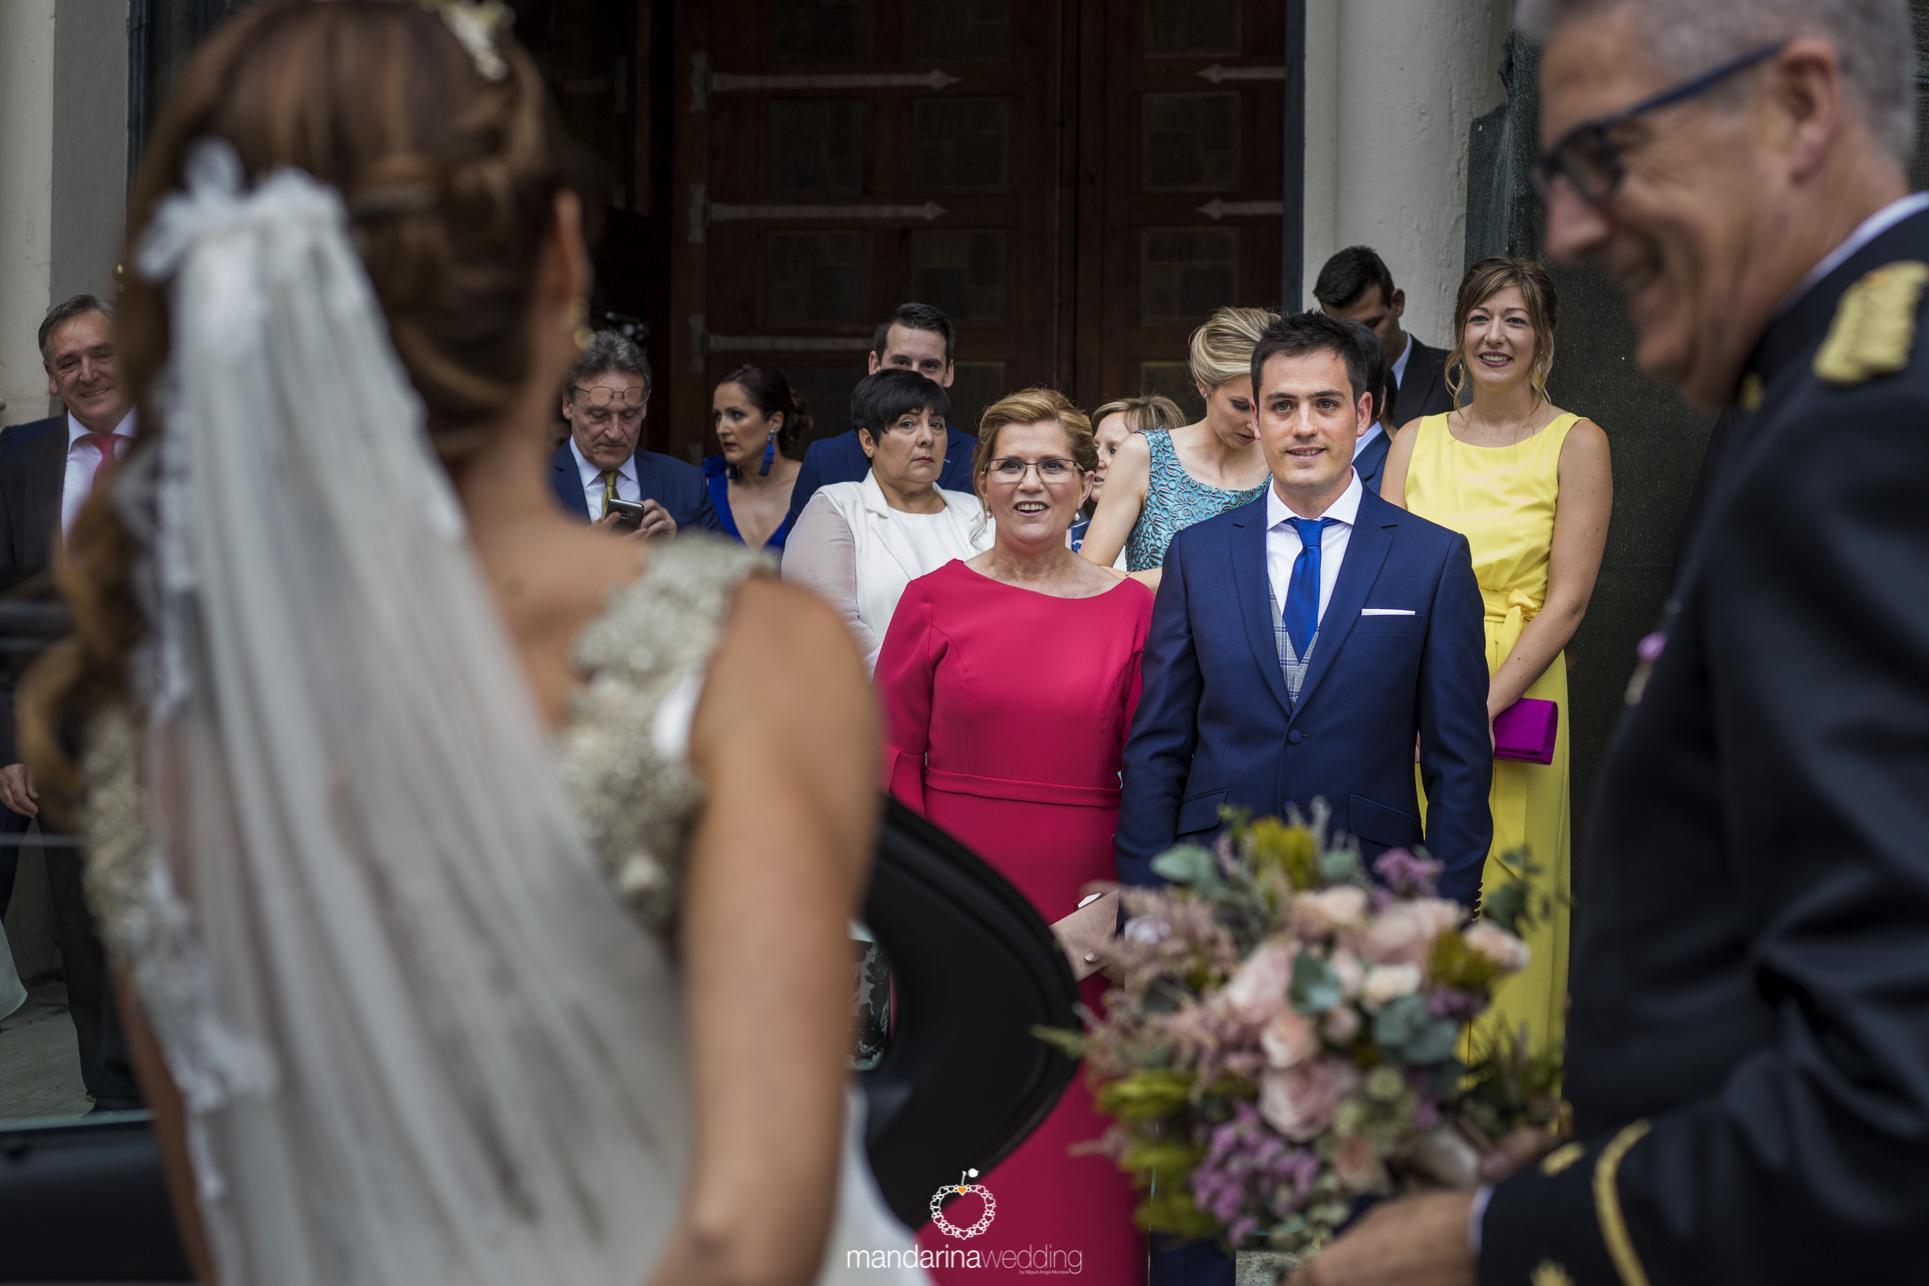 mandarina wedding, fotografo boda pais vasco, fotografo boda zaragoza, fotógrafo boda soria, fotografo boda Madrid, fotógrafo boda tarragona-16